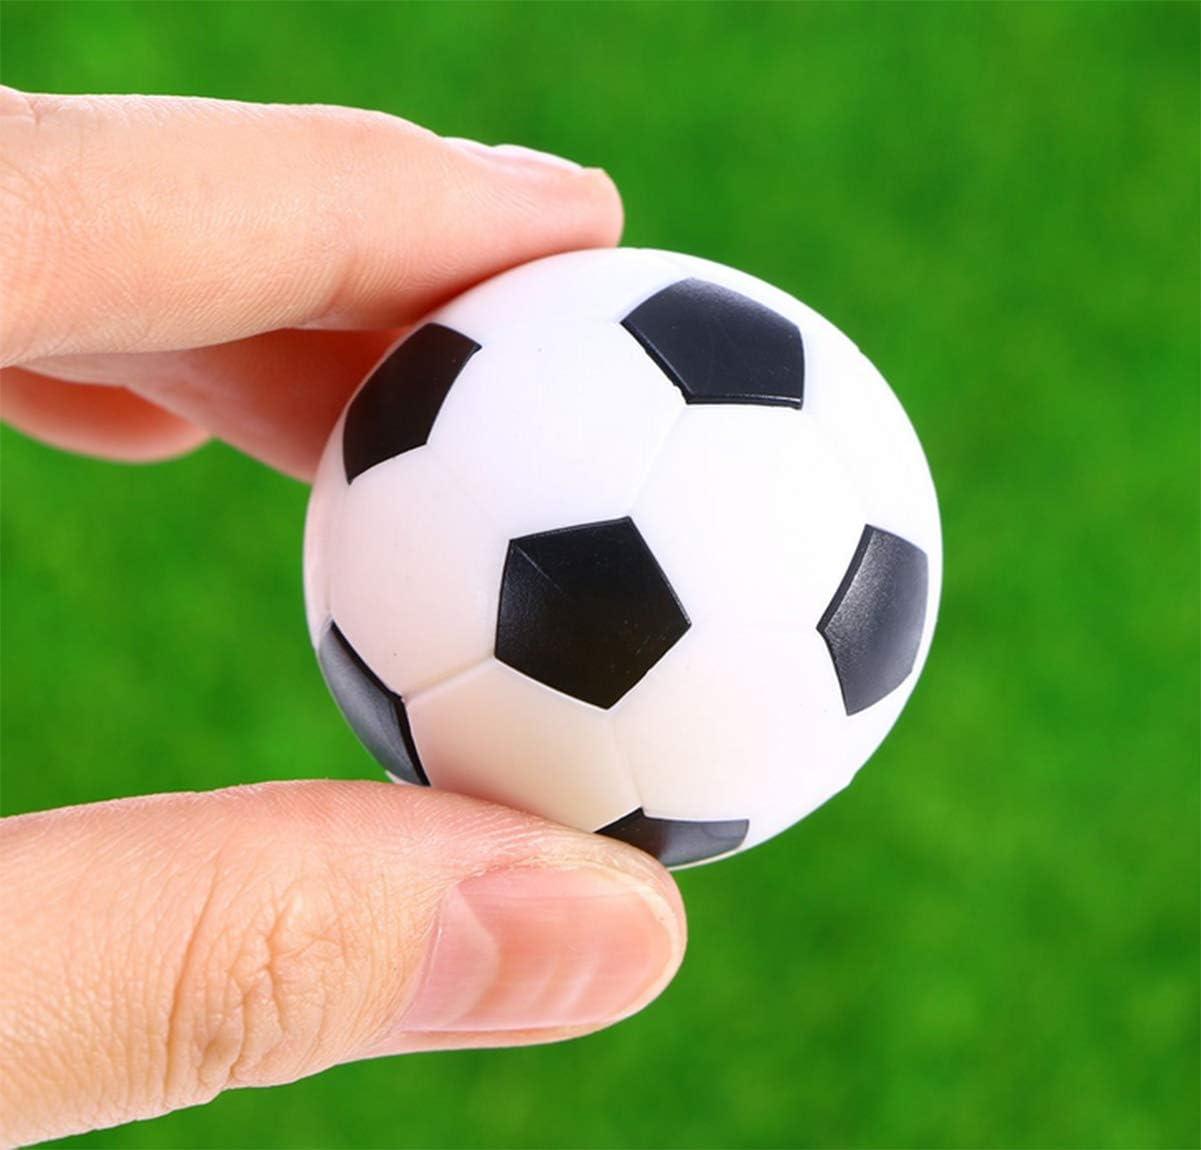 Liuer Futbolín Bolas Foosball 14PCS Reemplazos de Pelotas de ...